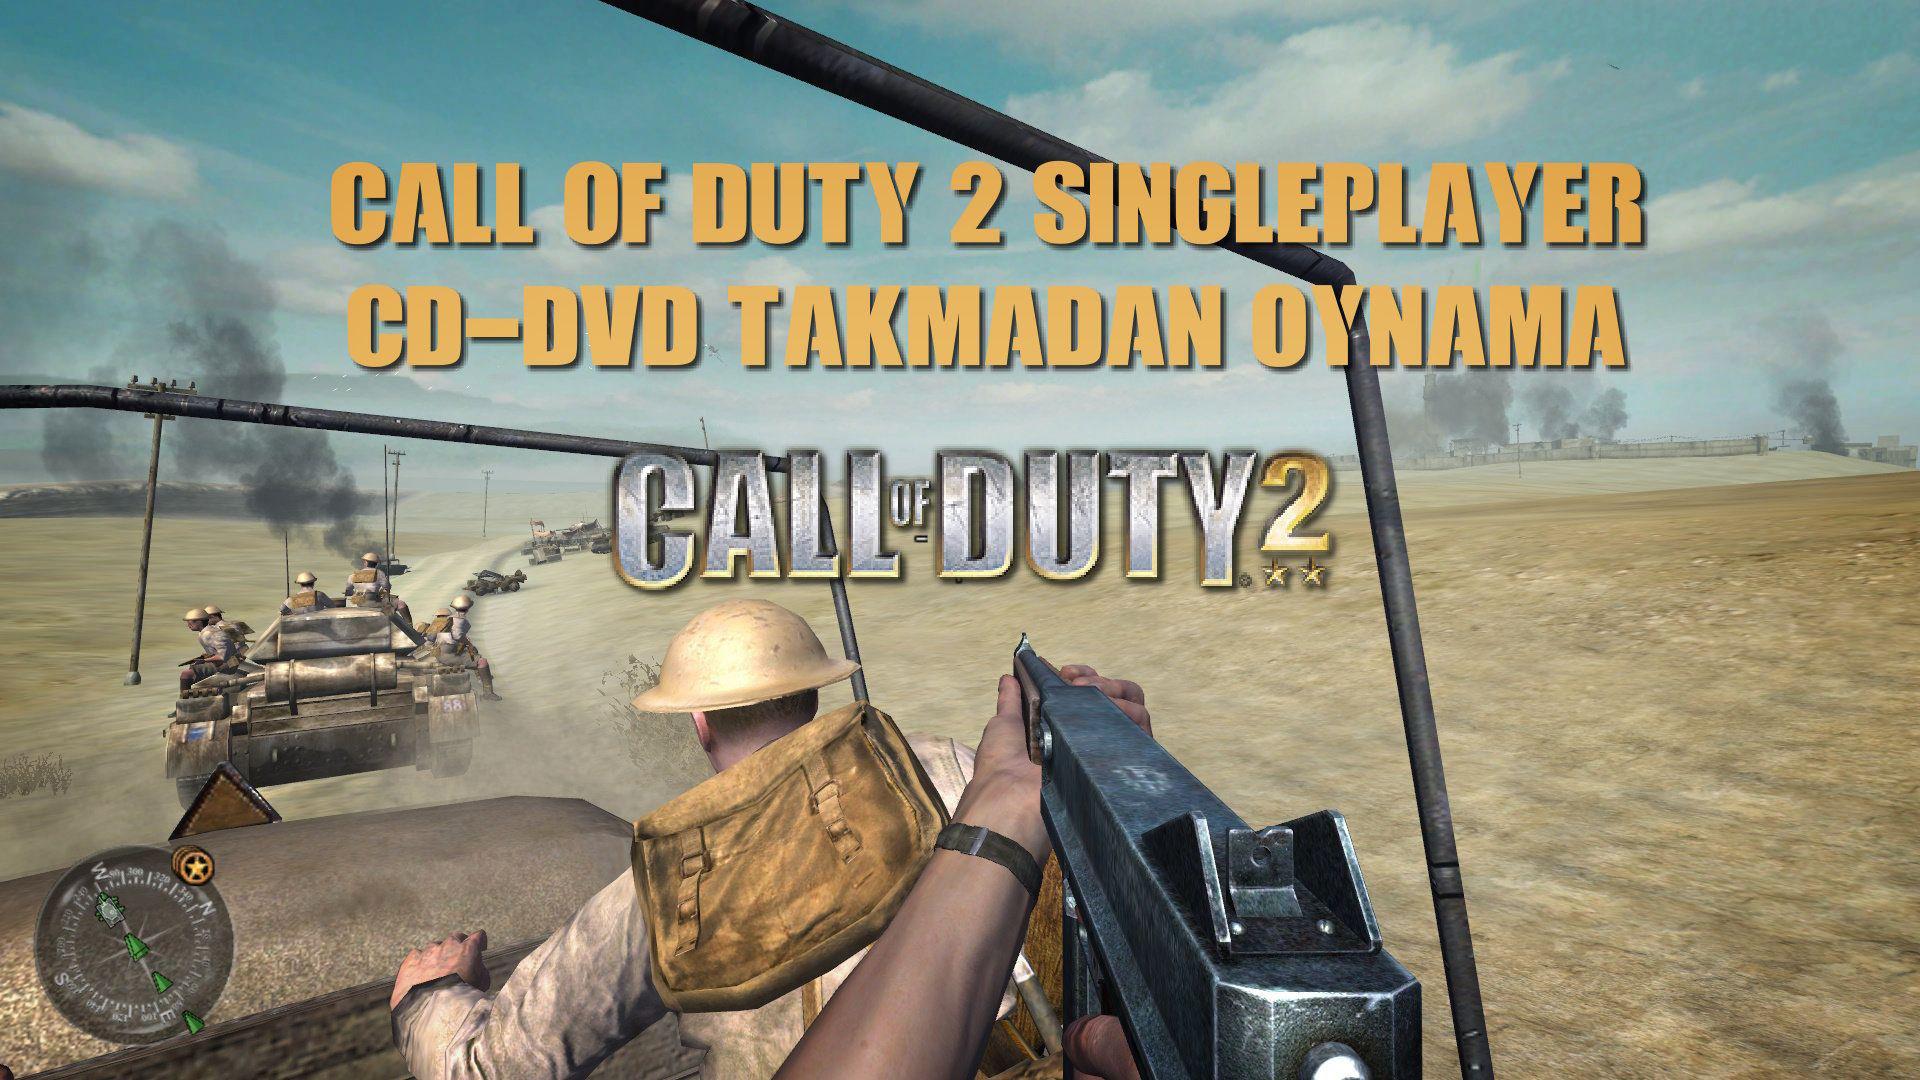 Call of Duty 2 SinglePlayer CD-DVD Takmadan Oynamak